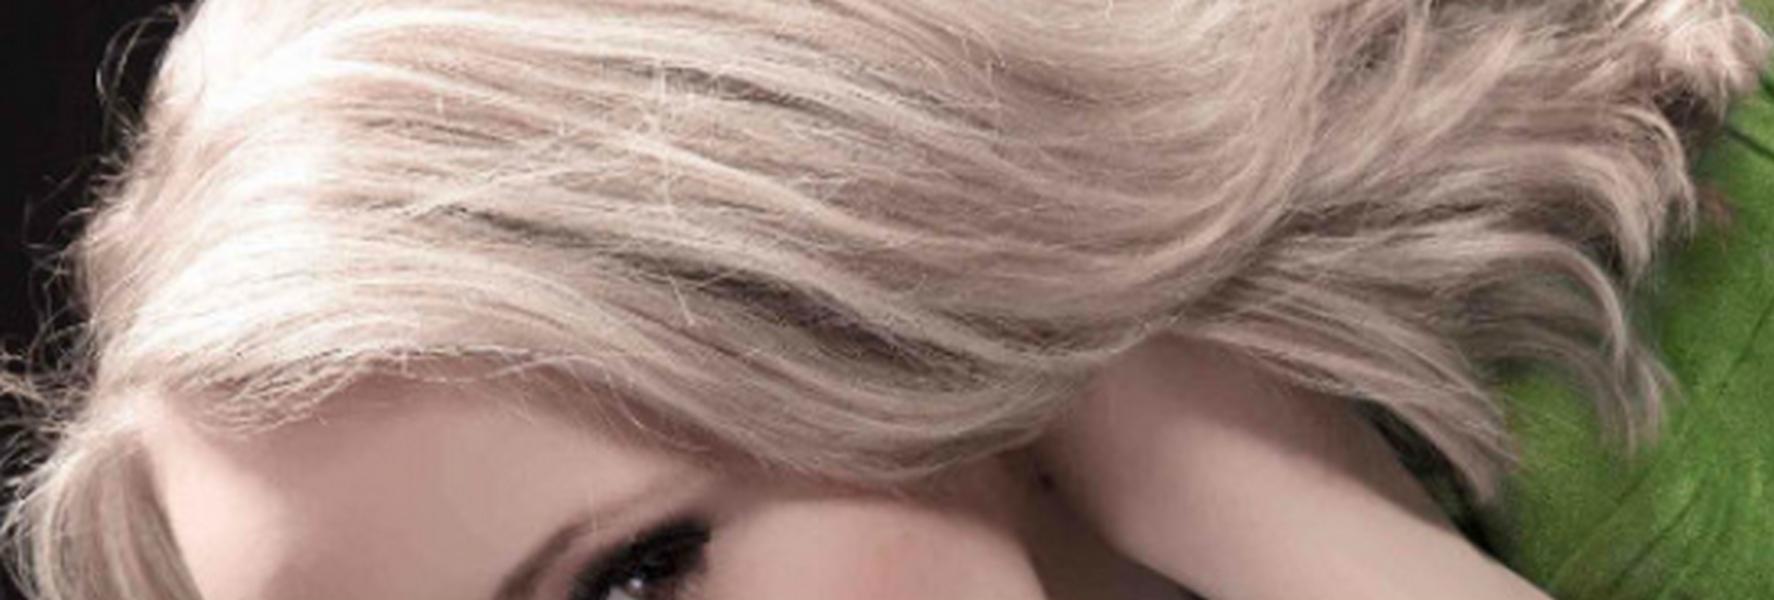 Velkoobchod vlasové kosmetiky Burian